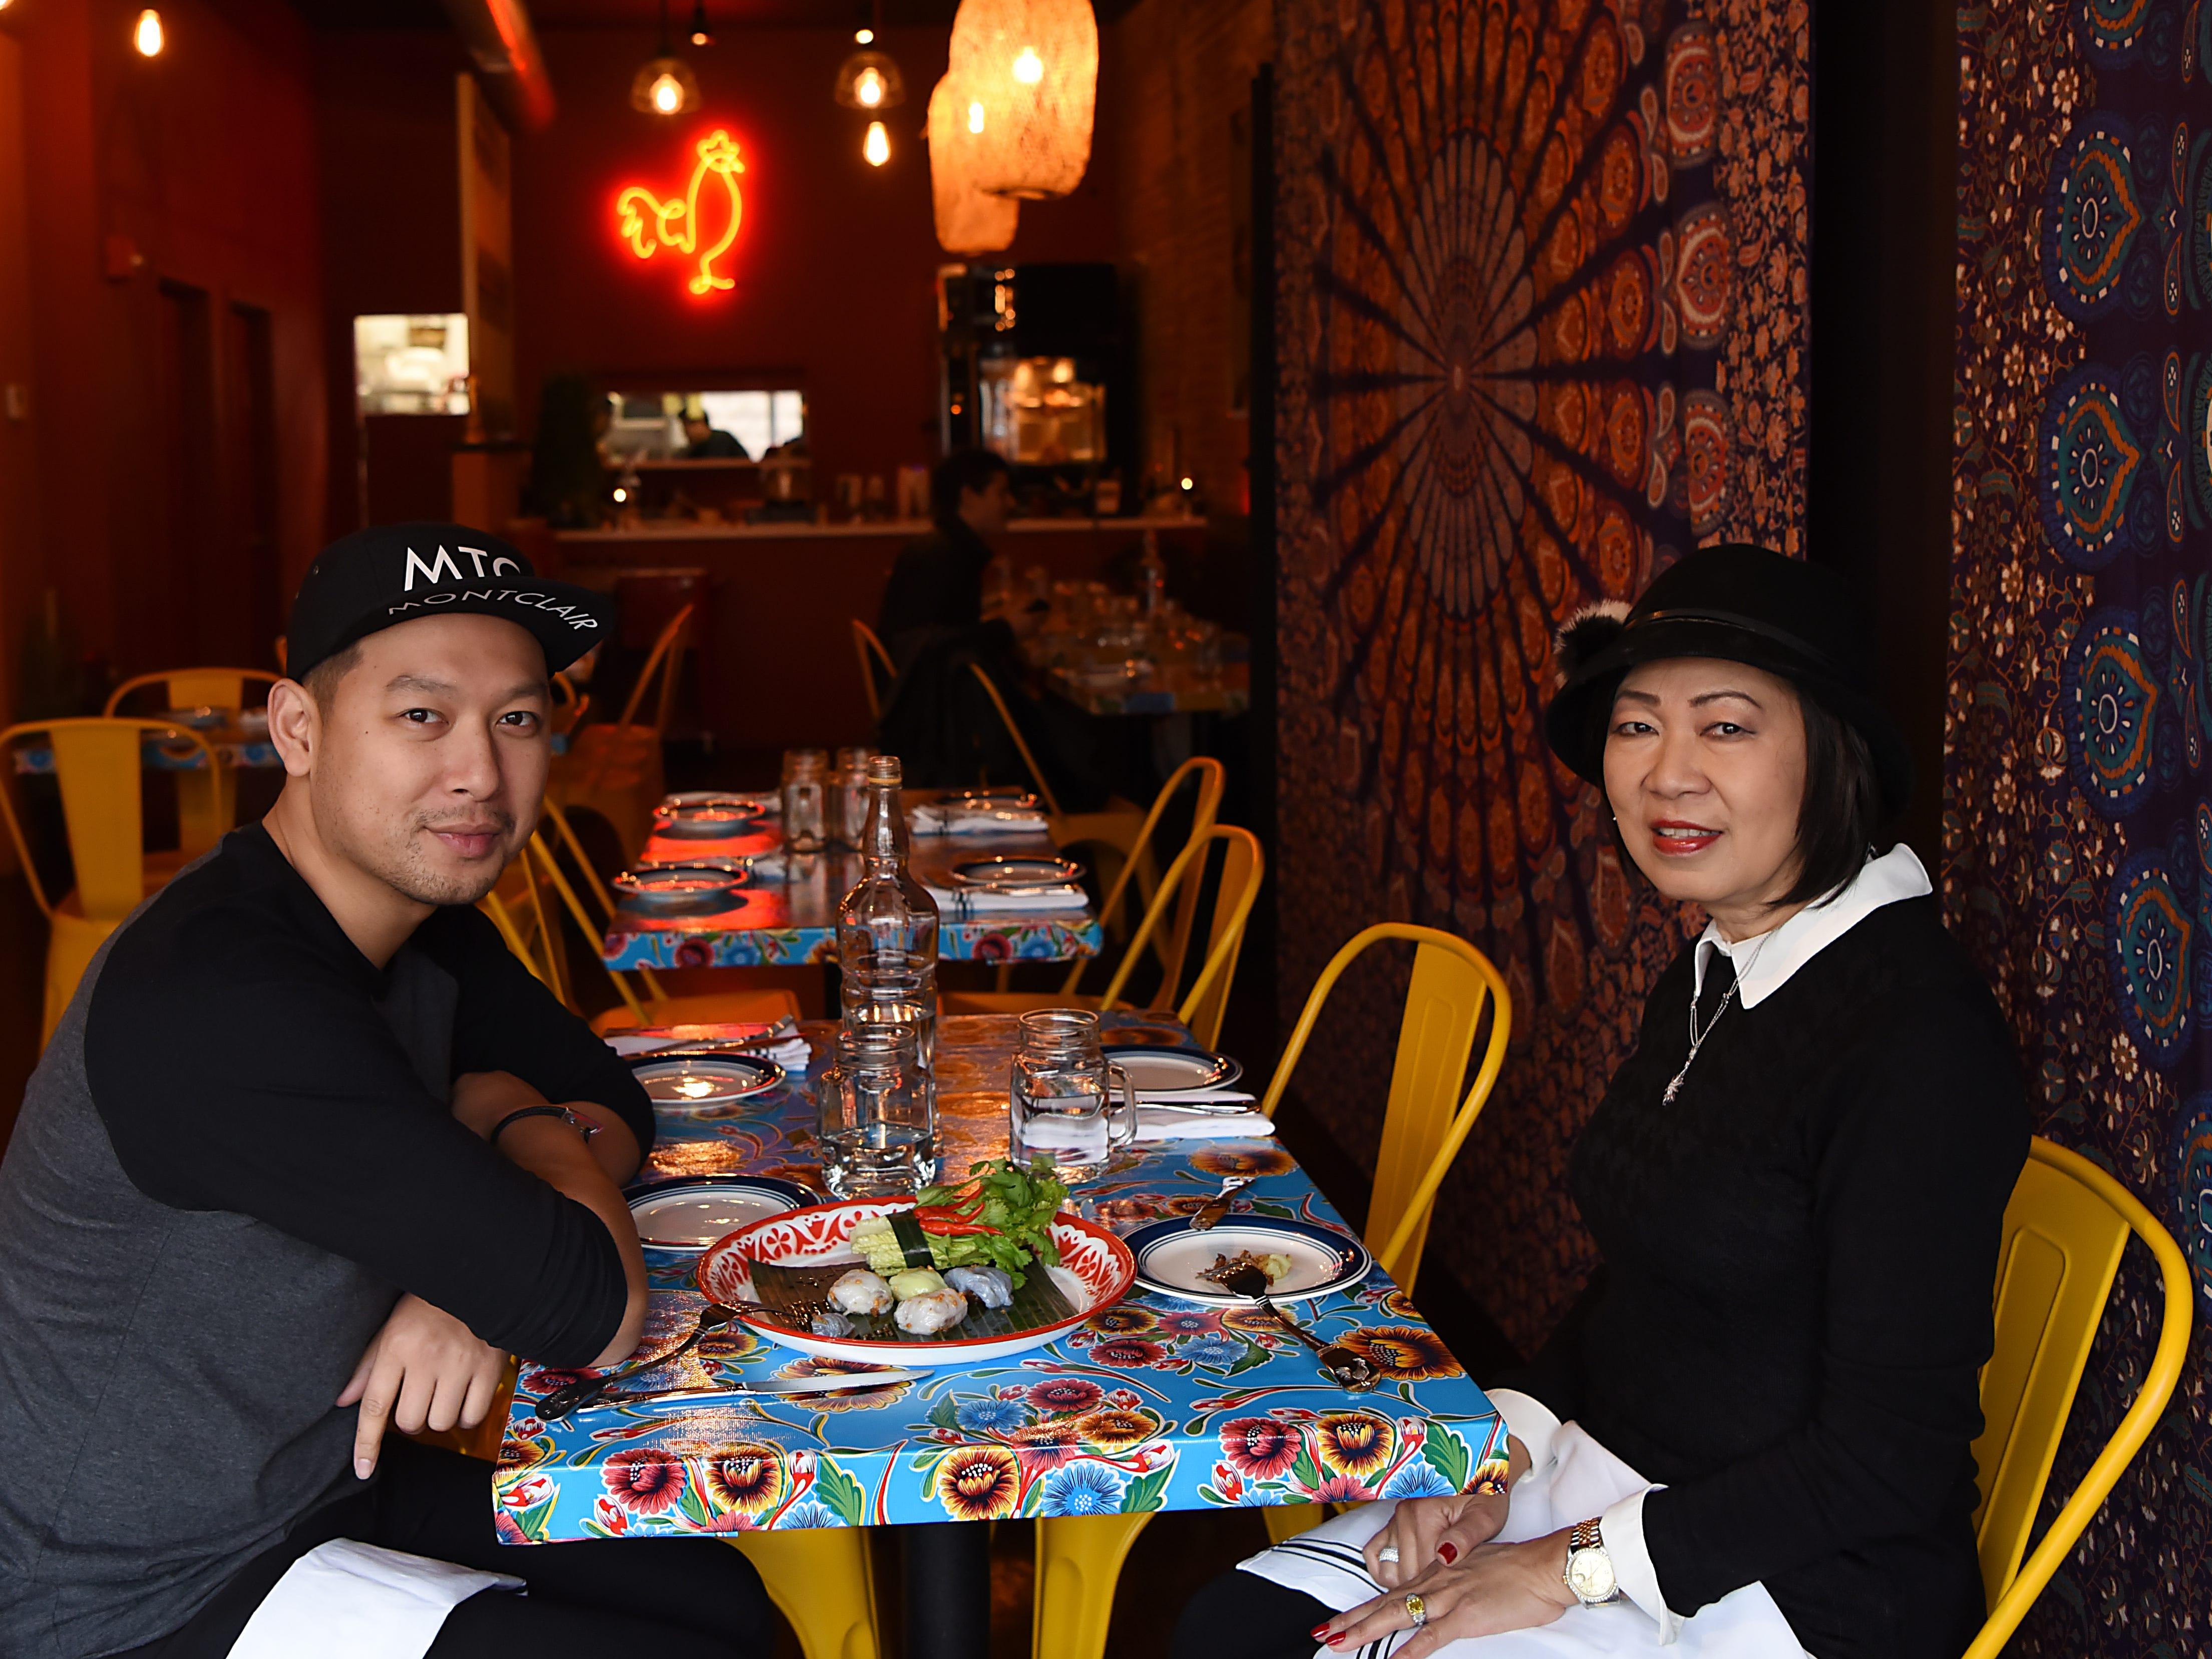 Sheree Sarabhaya and her son Luck Sarabhayavinija both own restaurants on Bloomfield Avenue in Montclair. They pose for photos at Kai Yang on Thursday December 20, 2018.